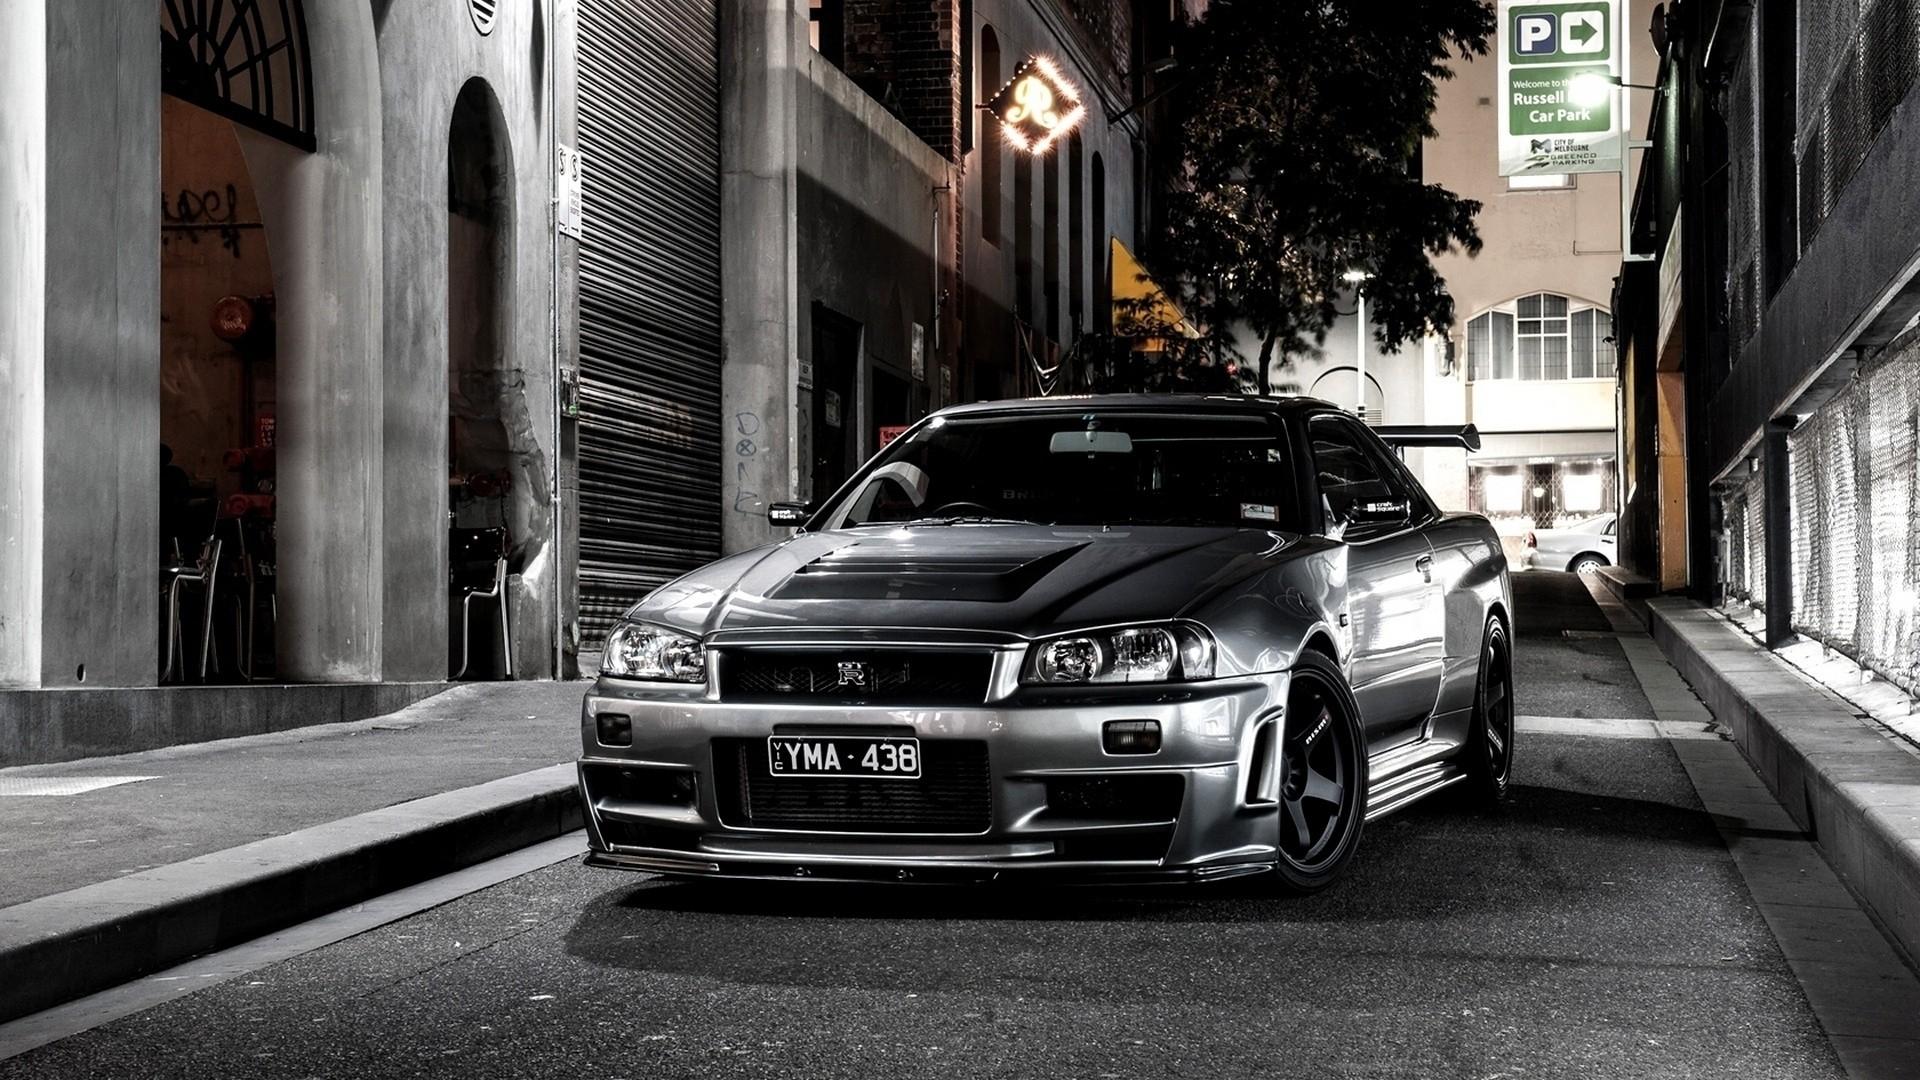 HD Cars Wallpapers 1080p ·① WallpaperTag